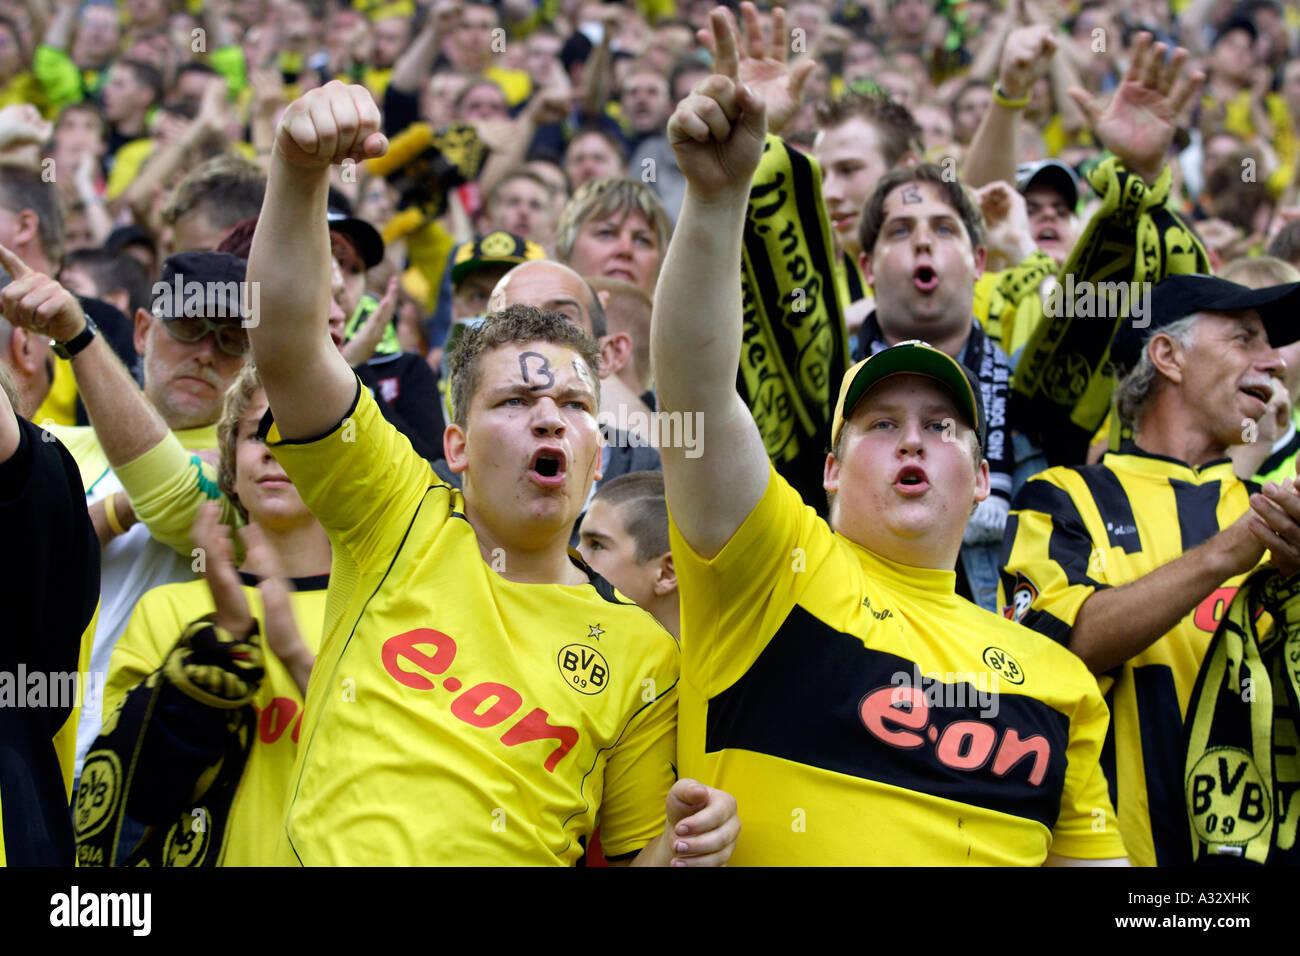 Fans of Borussia Dortmund football club at a stadium, Germany - Stock Image